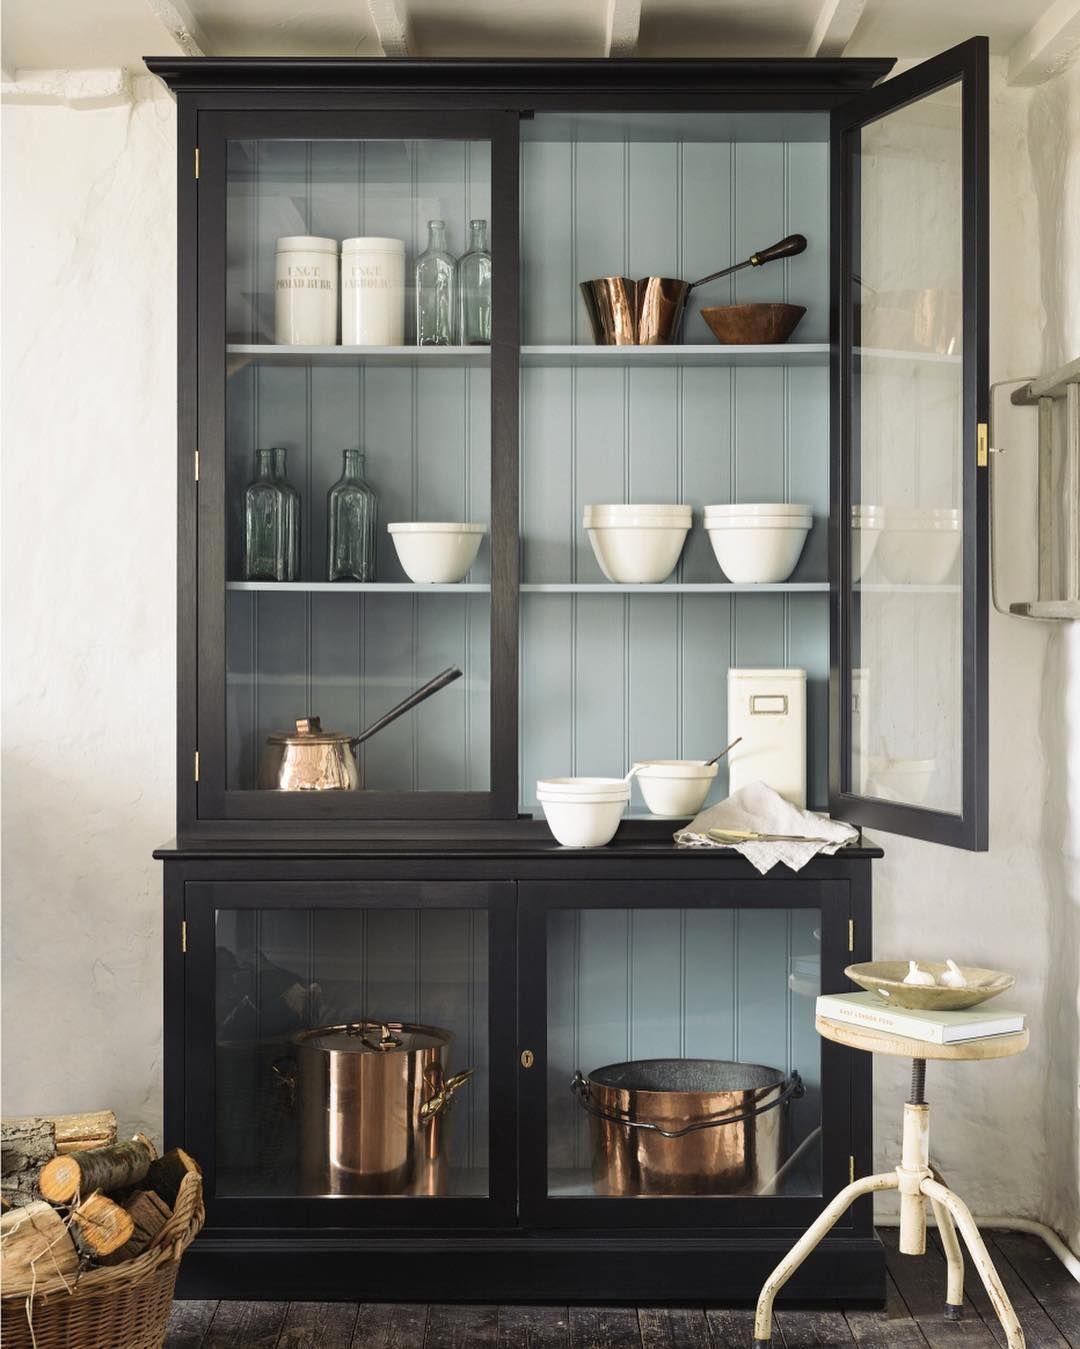 How Beautiful Is Our Curiosity Cupboard!? We Imagine